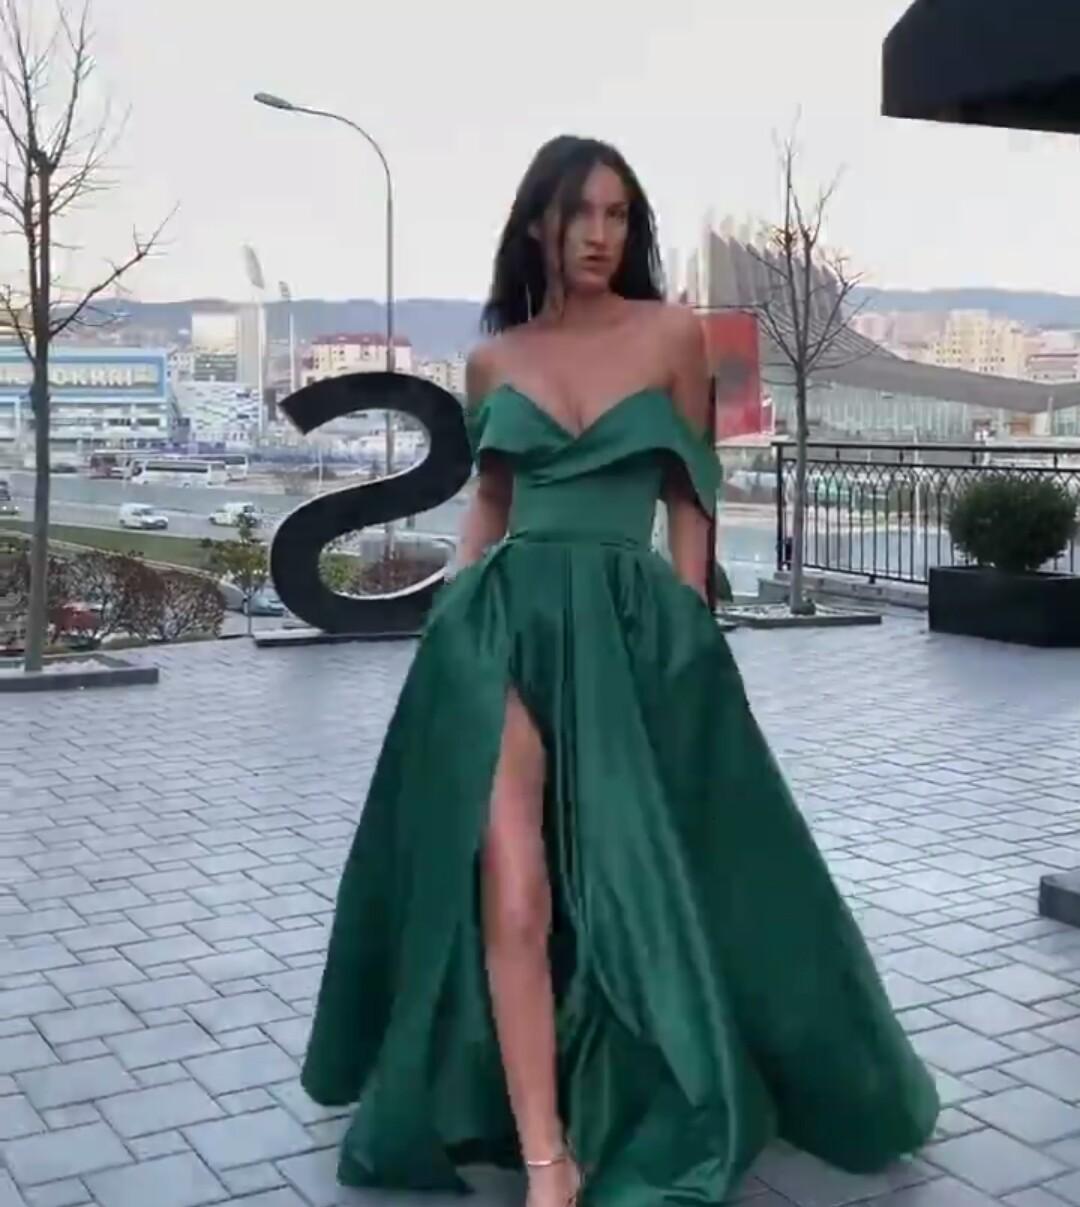 Elegant Green A-line Evening Dresses Sweetheart Sleeveless High-split Party Gown Satin Cheap Floor-length Formal Prom Dress Custom Made